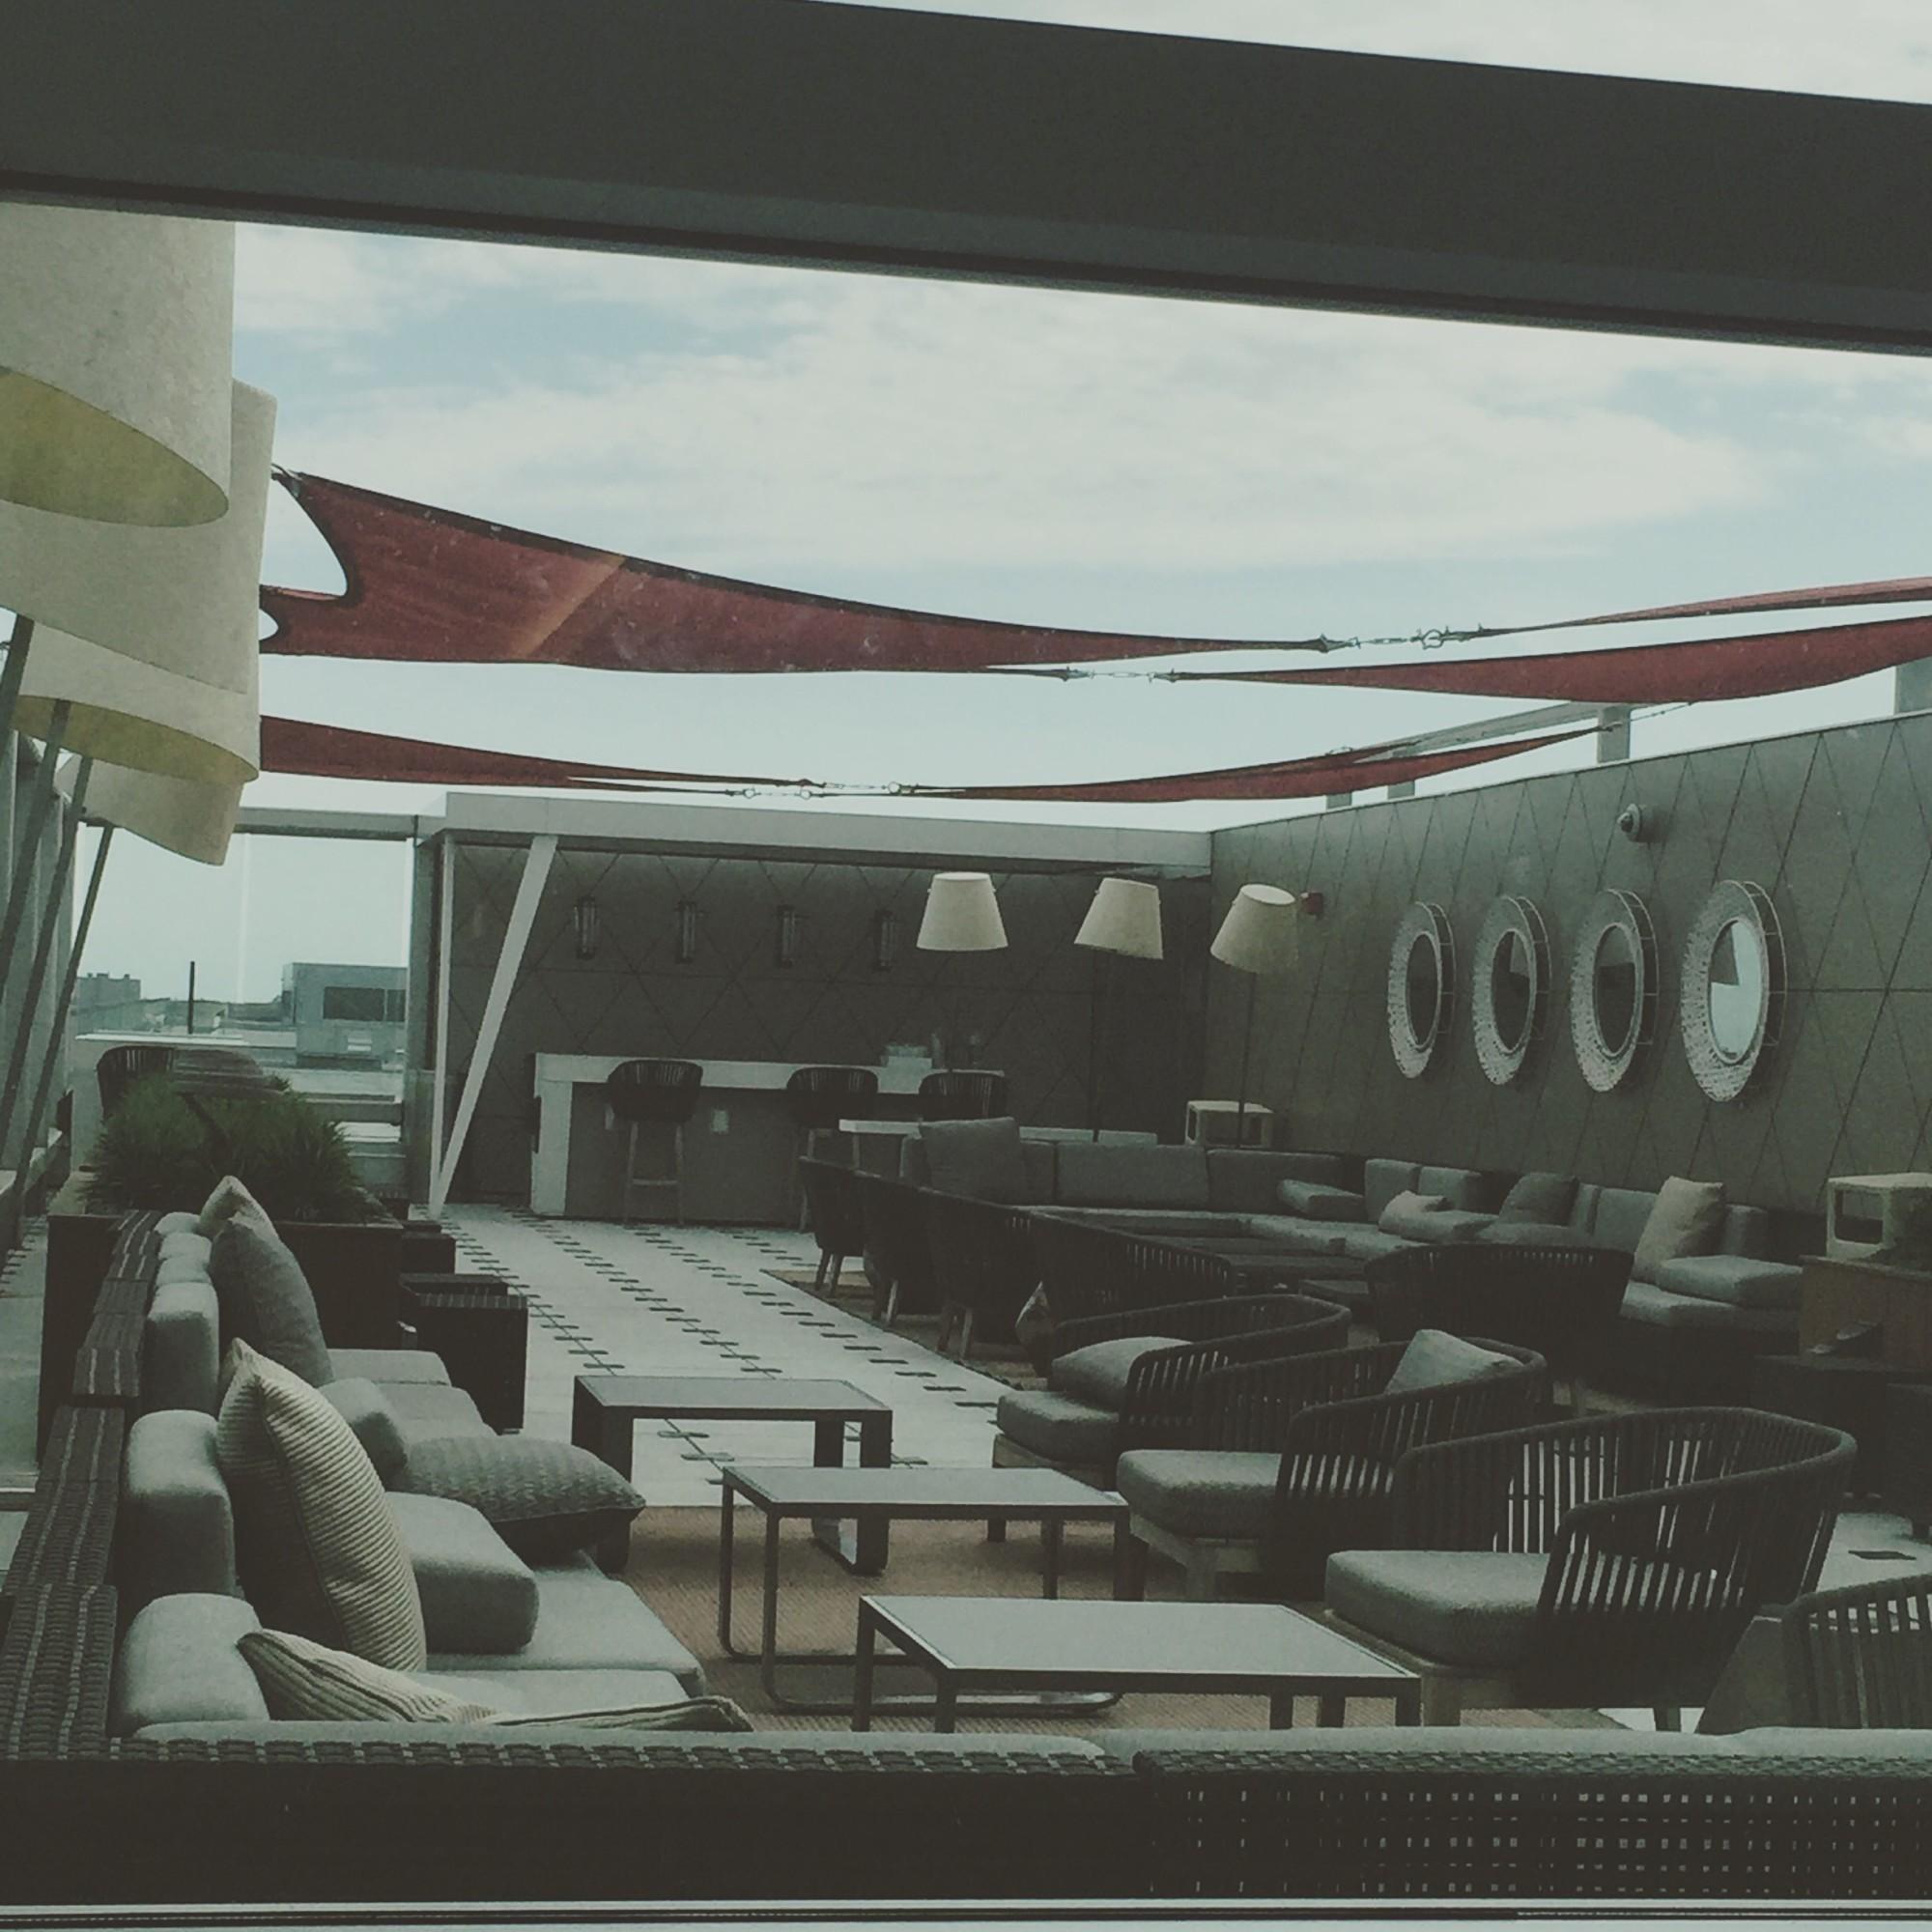 American Express Platinum Customer Service >> JFK: Delta Air Lines Delta Sky Club Reviews & Photos - Terminal 4, Concourse B, John F. Kennedy ...